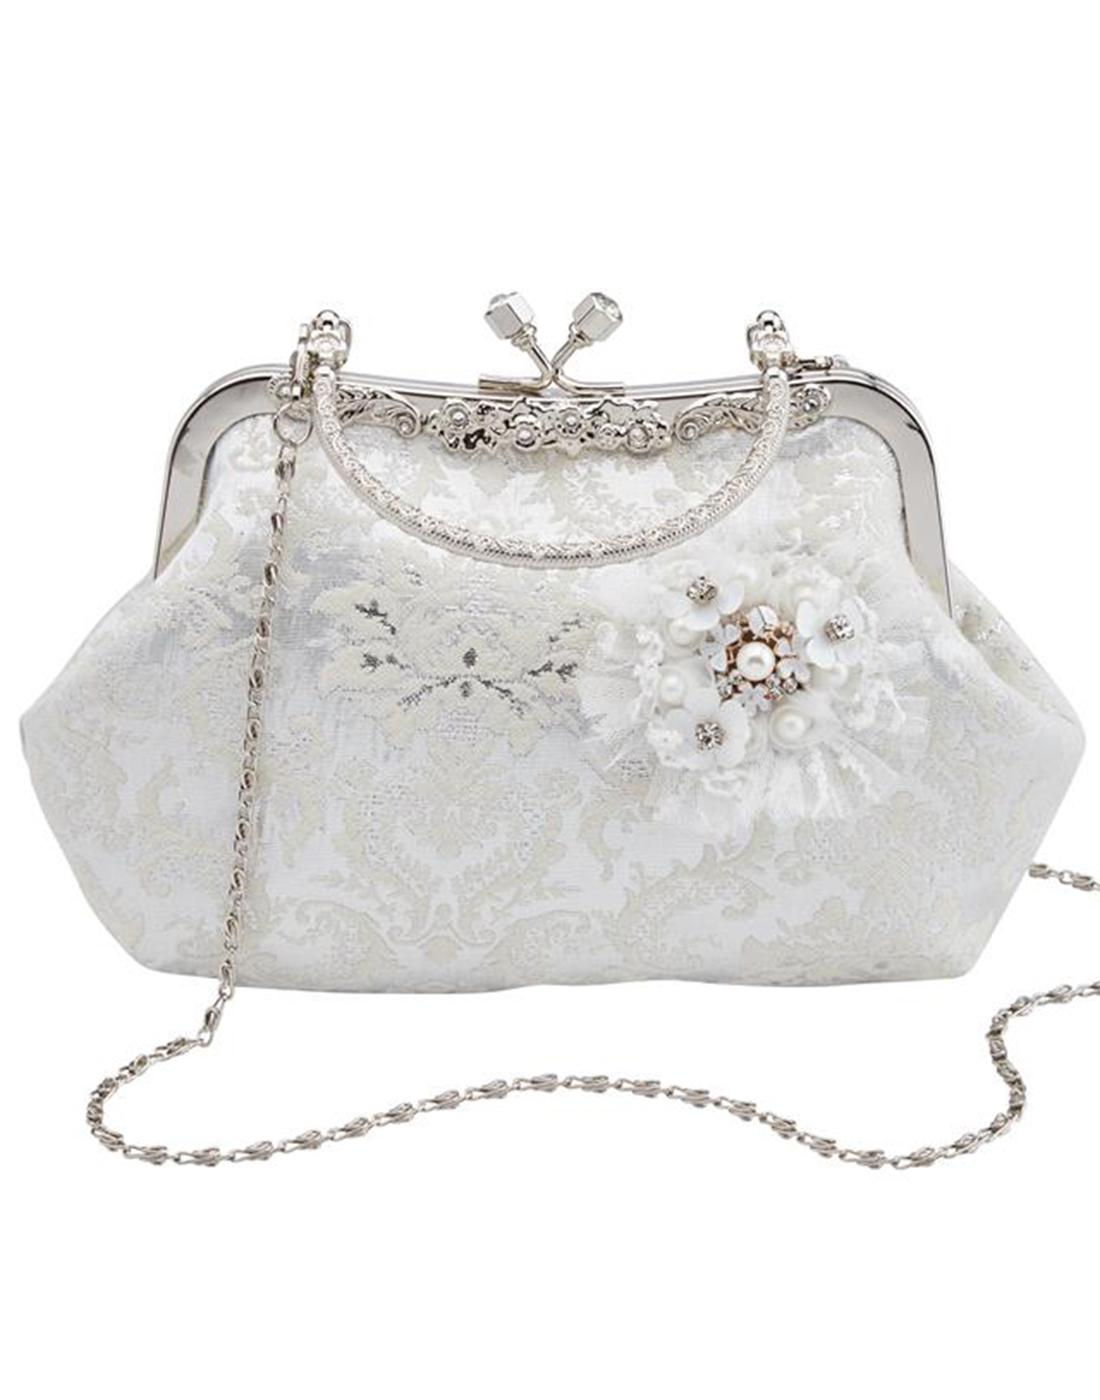 Hitched JOE BROWNS Bridal Vintage Handbag- Ivory